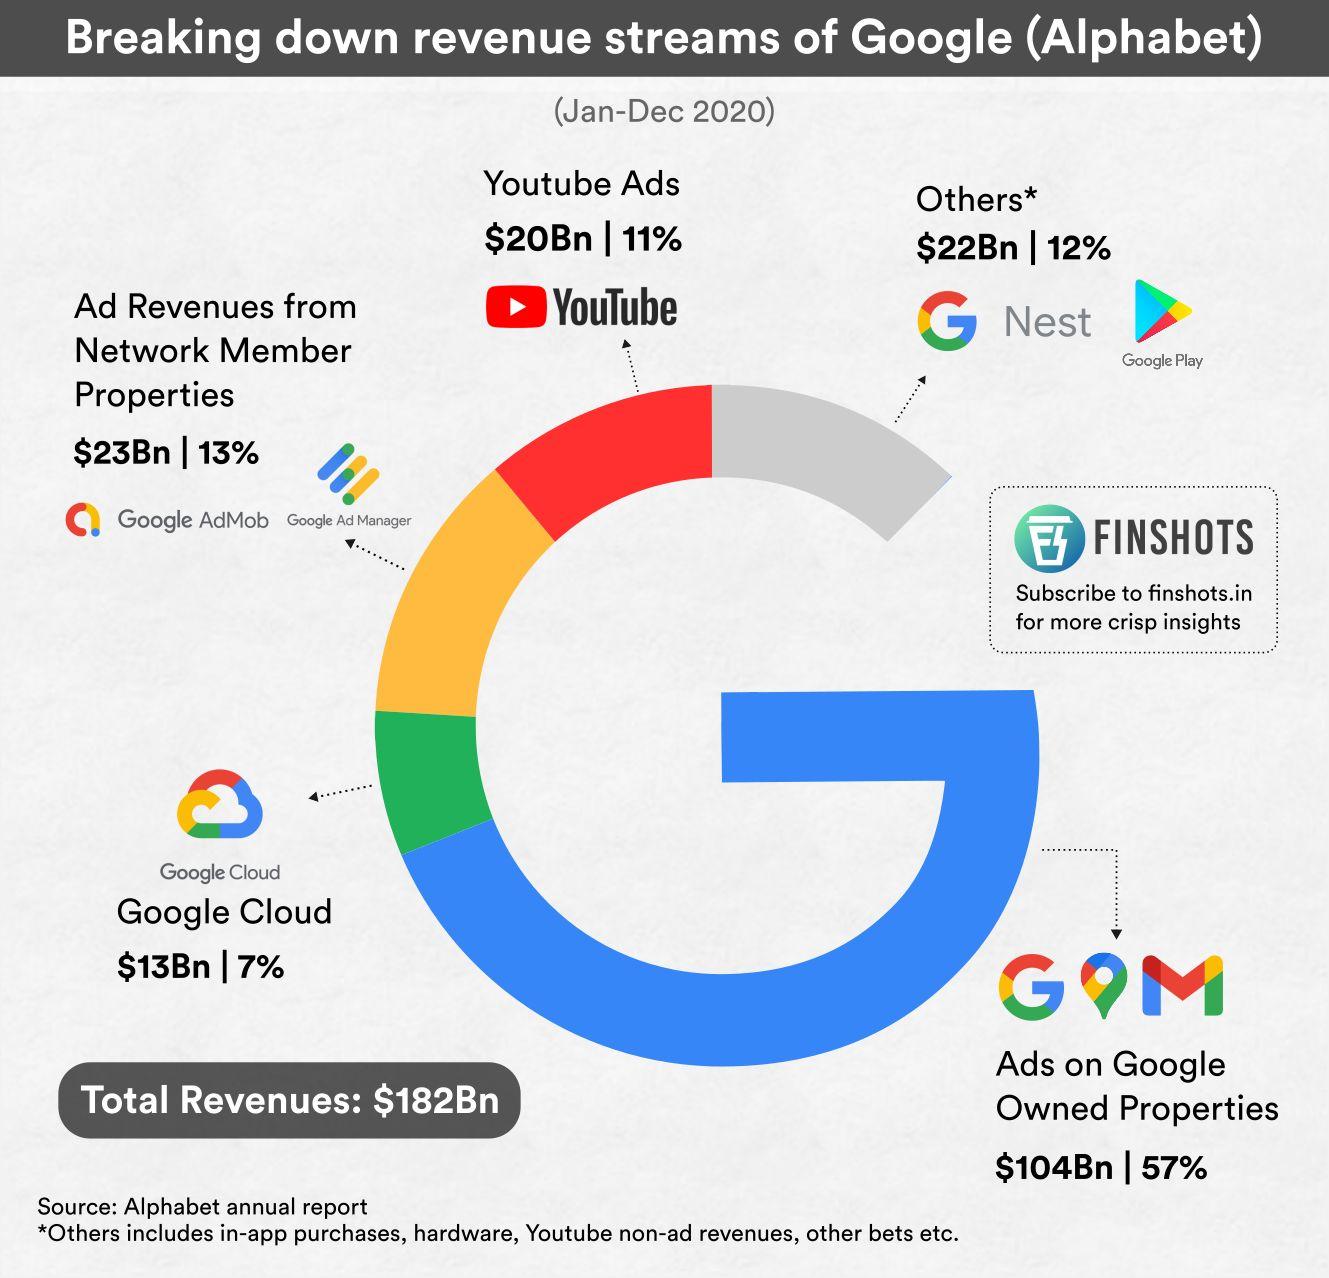 Breaking down revenue streams of Google (Alphabet)